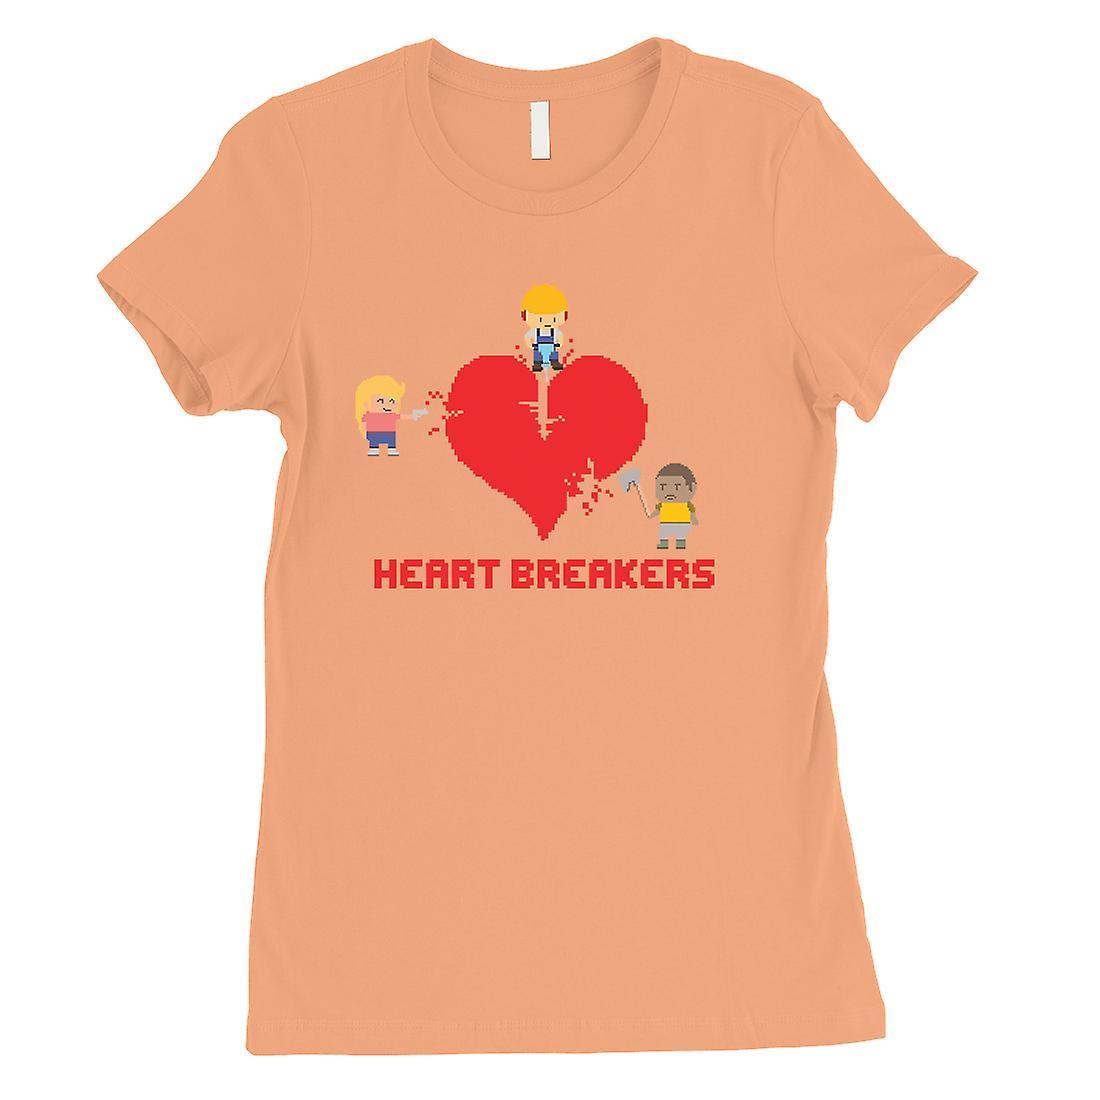 Heart Breakers Womens Peach Humorous Anniversary Cadeau T-Shirt